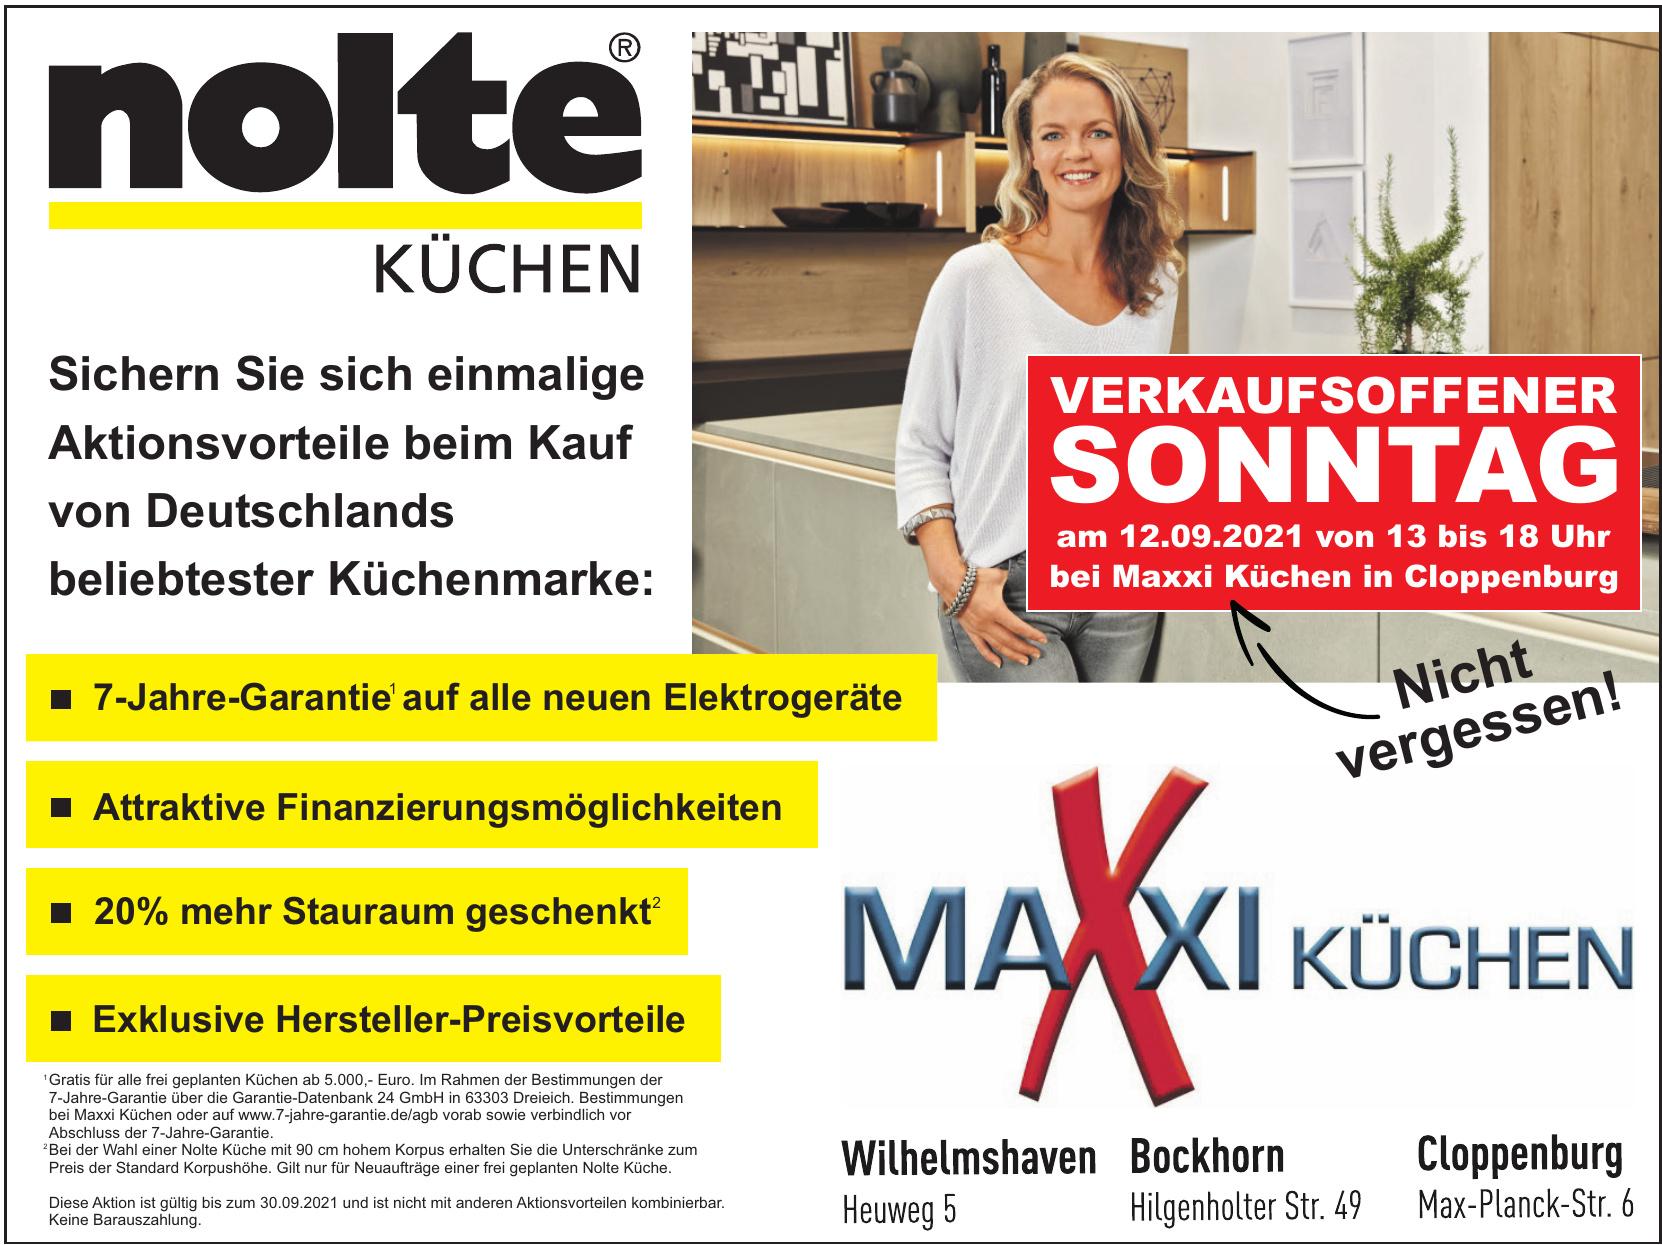 Maxxi Küchen